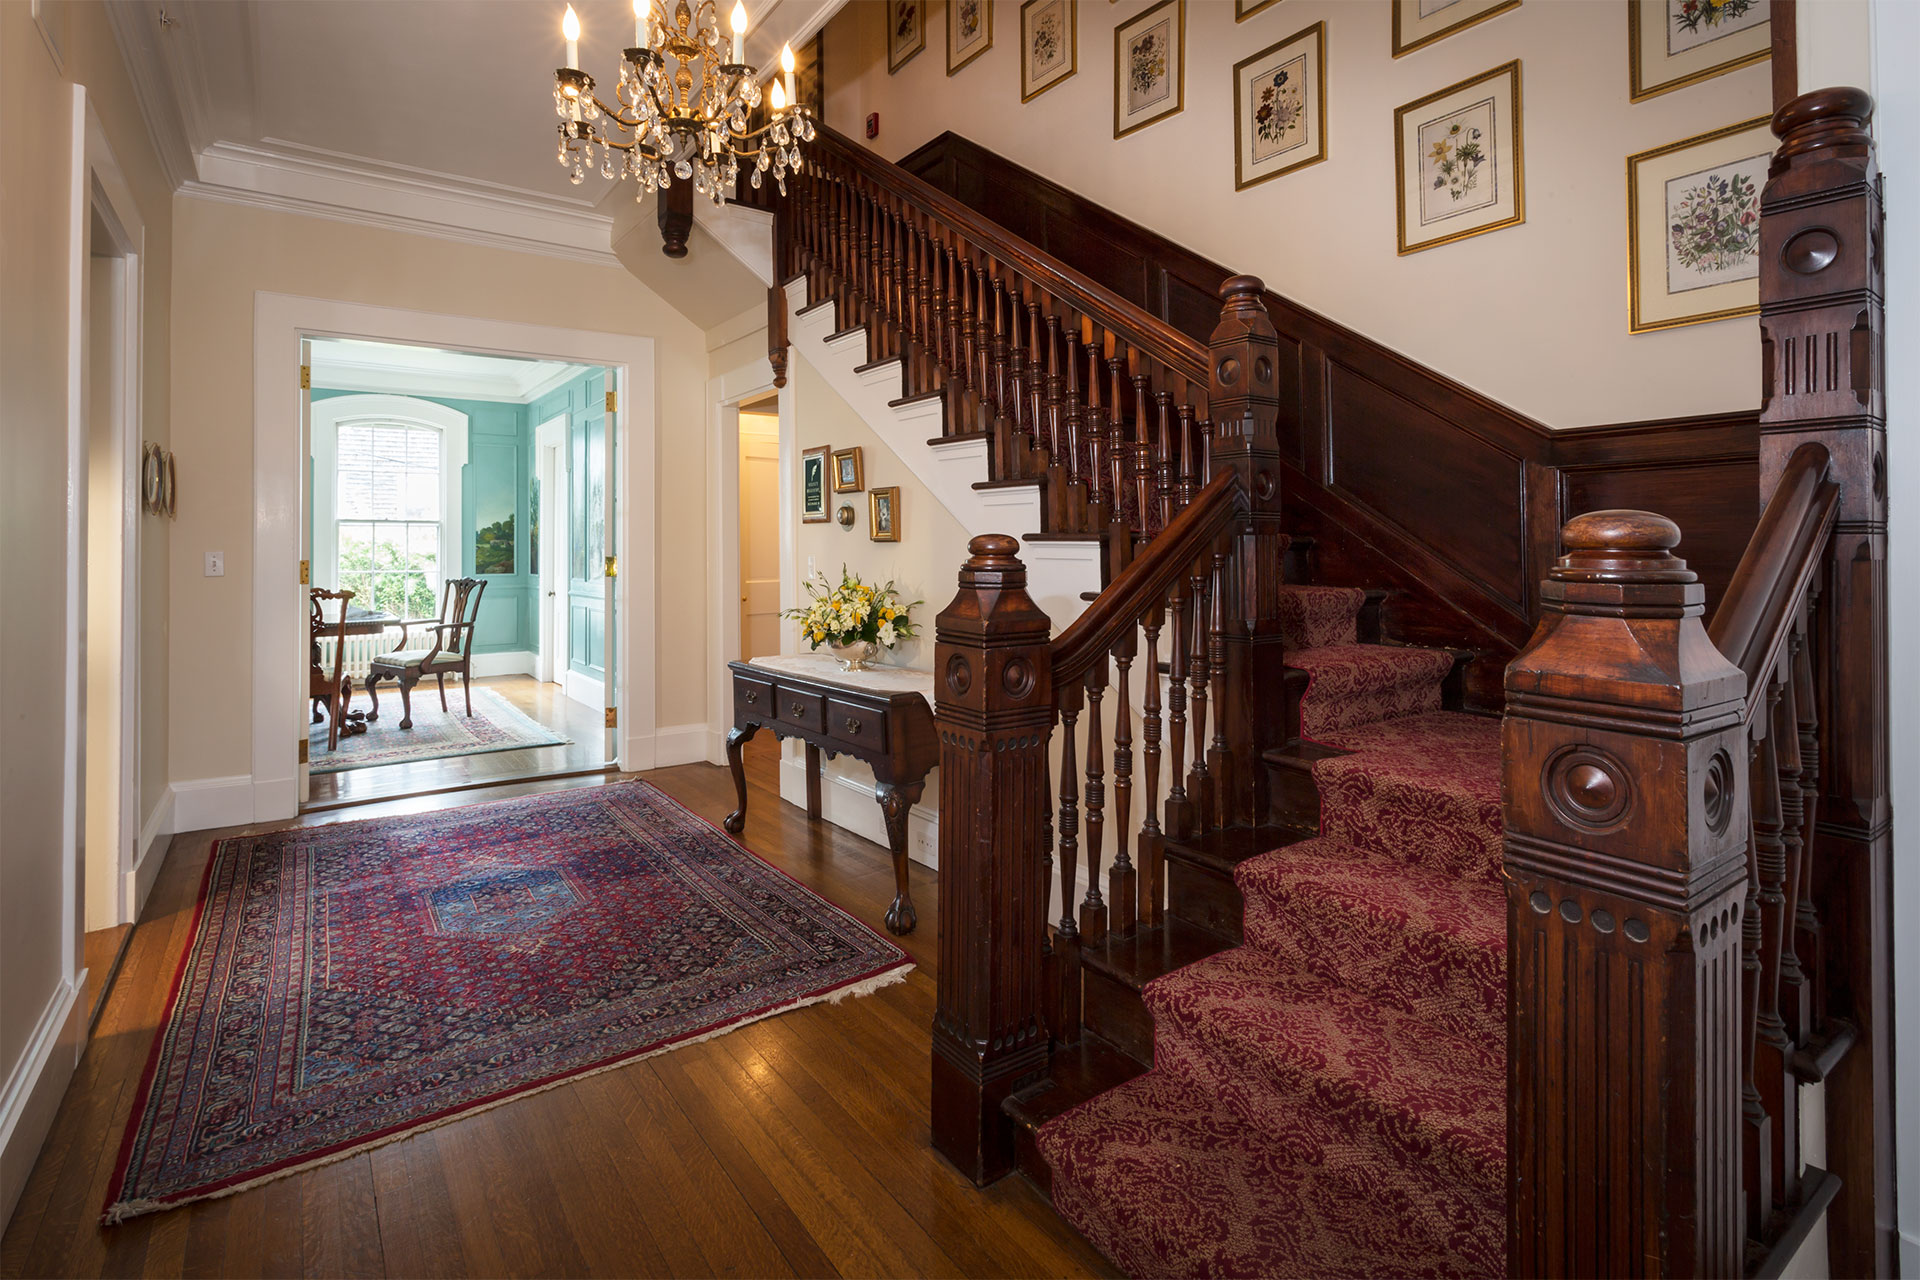 La Farge Perry House Bed & Breakfast - Newport, RI